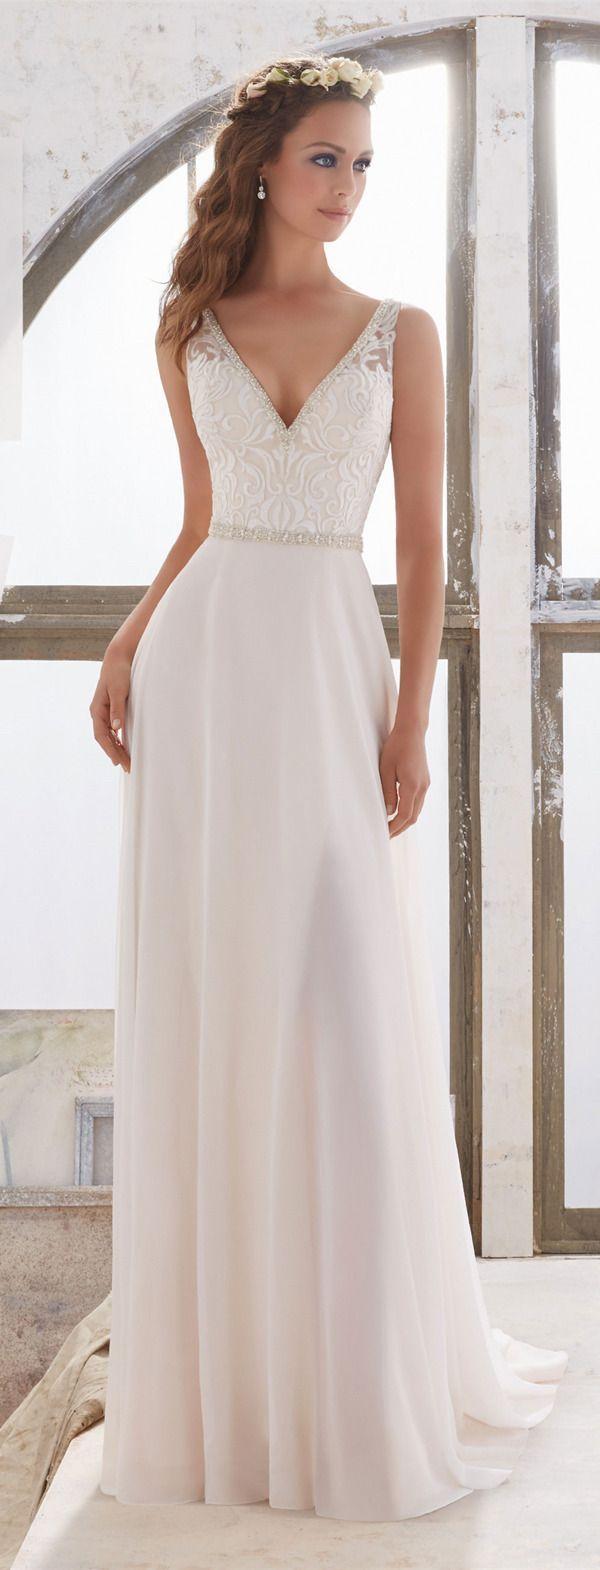 Wedding dress designers under 5000  Simple Backyard Wedding Dresses  Dresses for Guest at Wedding Check